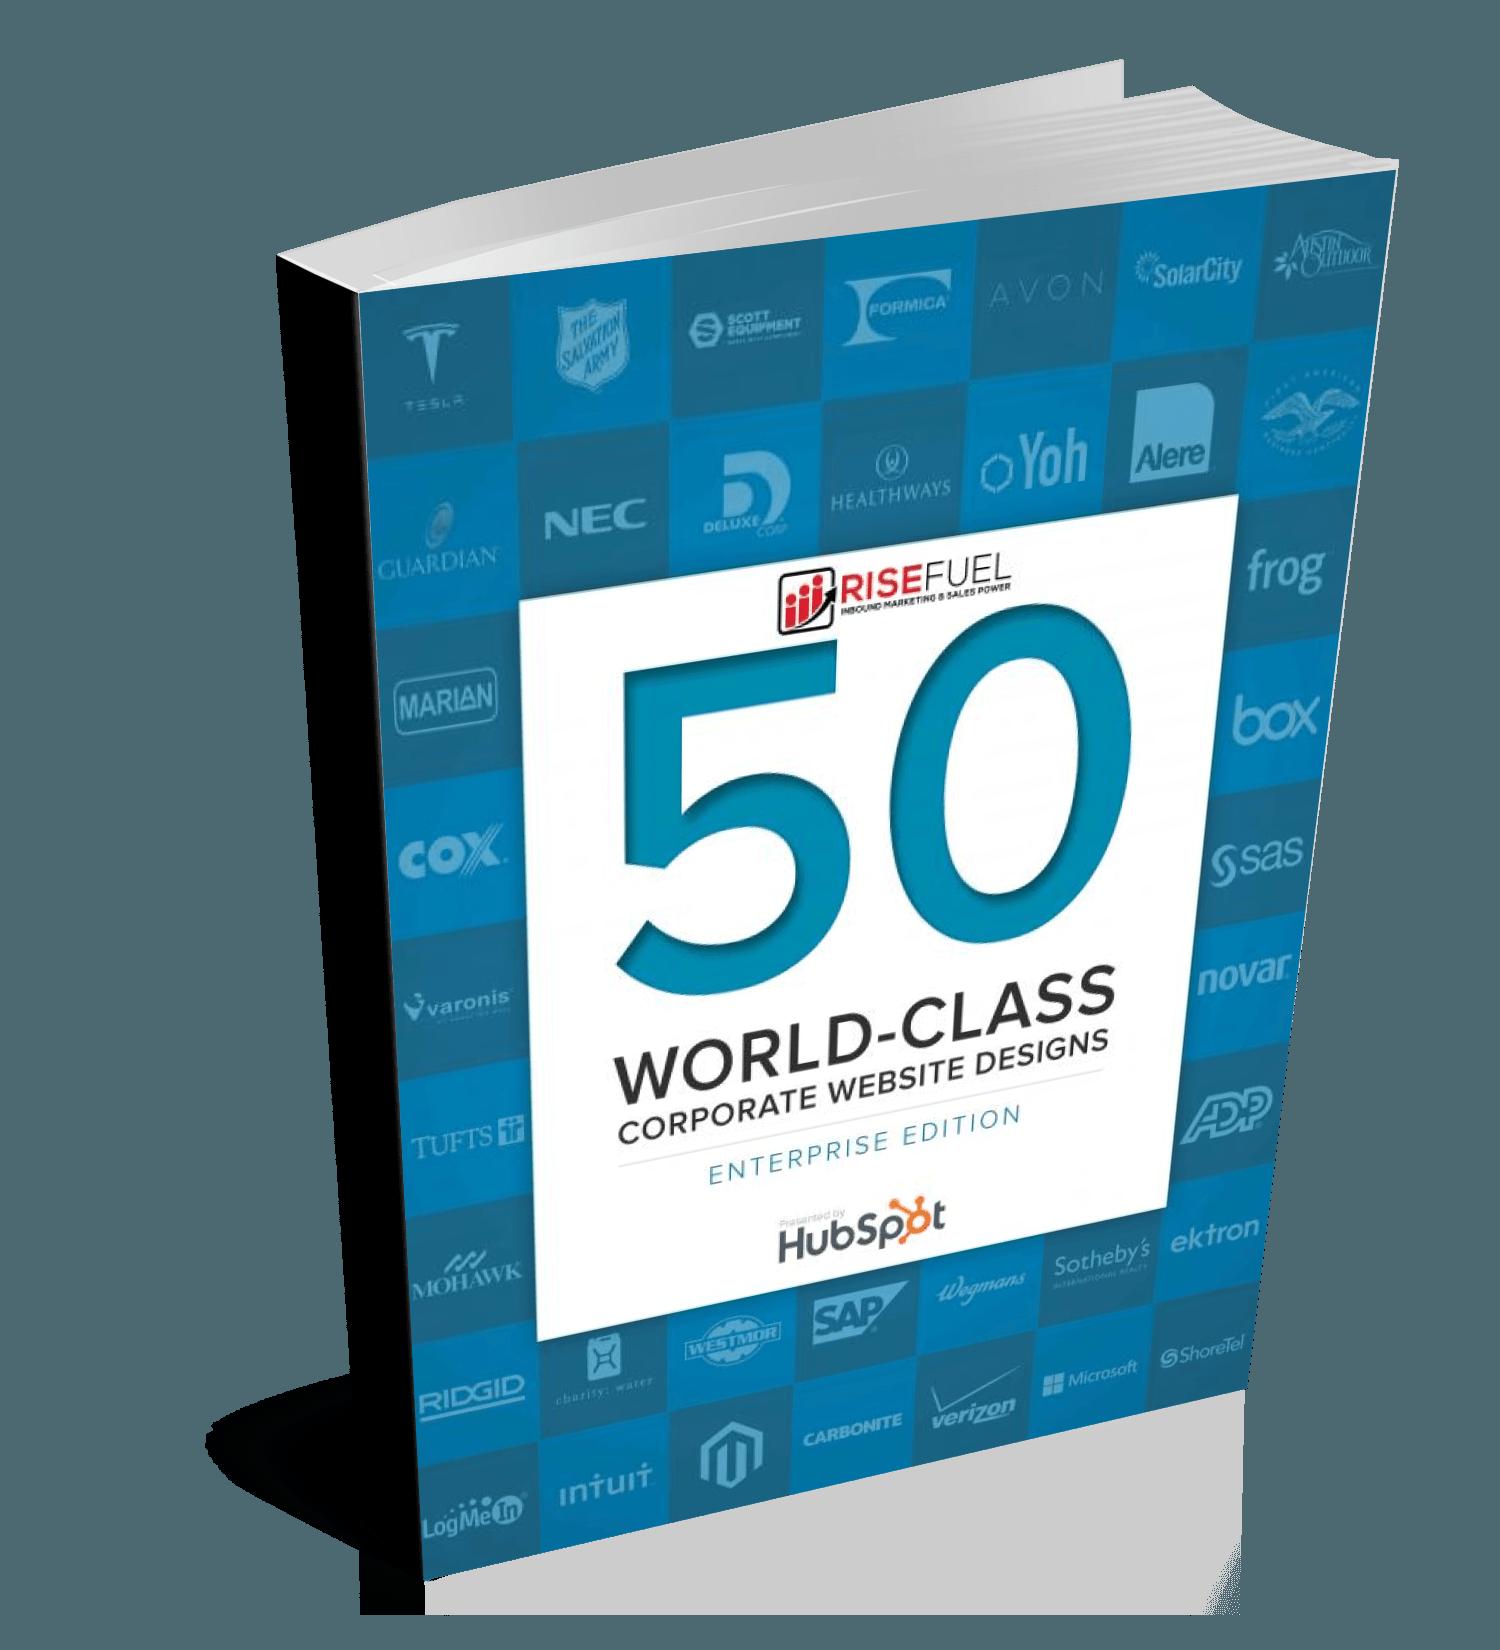 website designs ebook